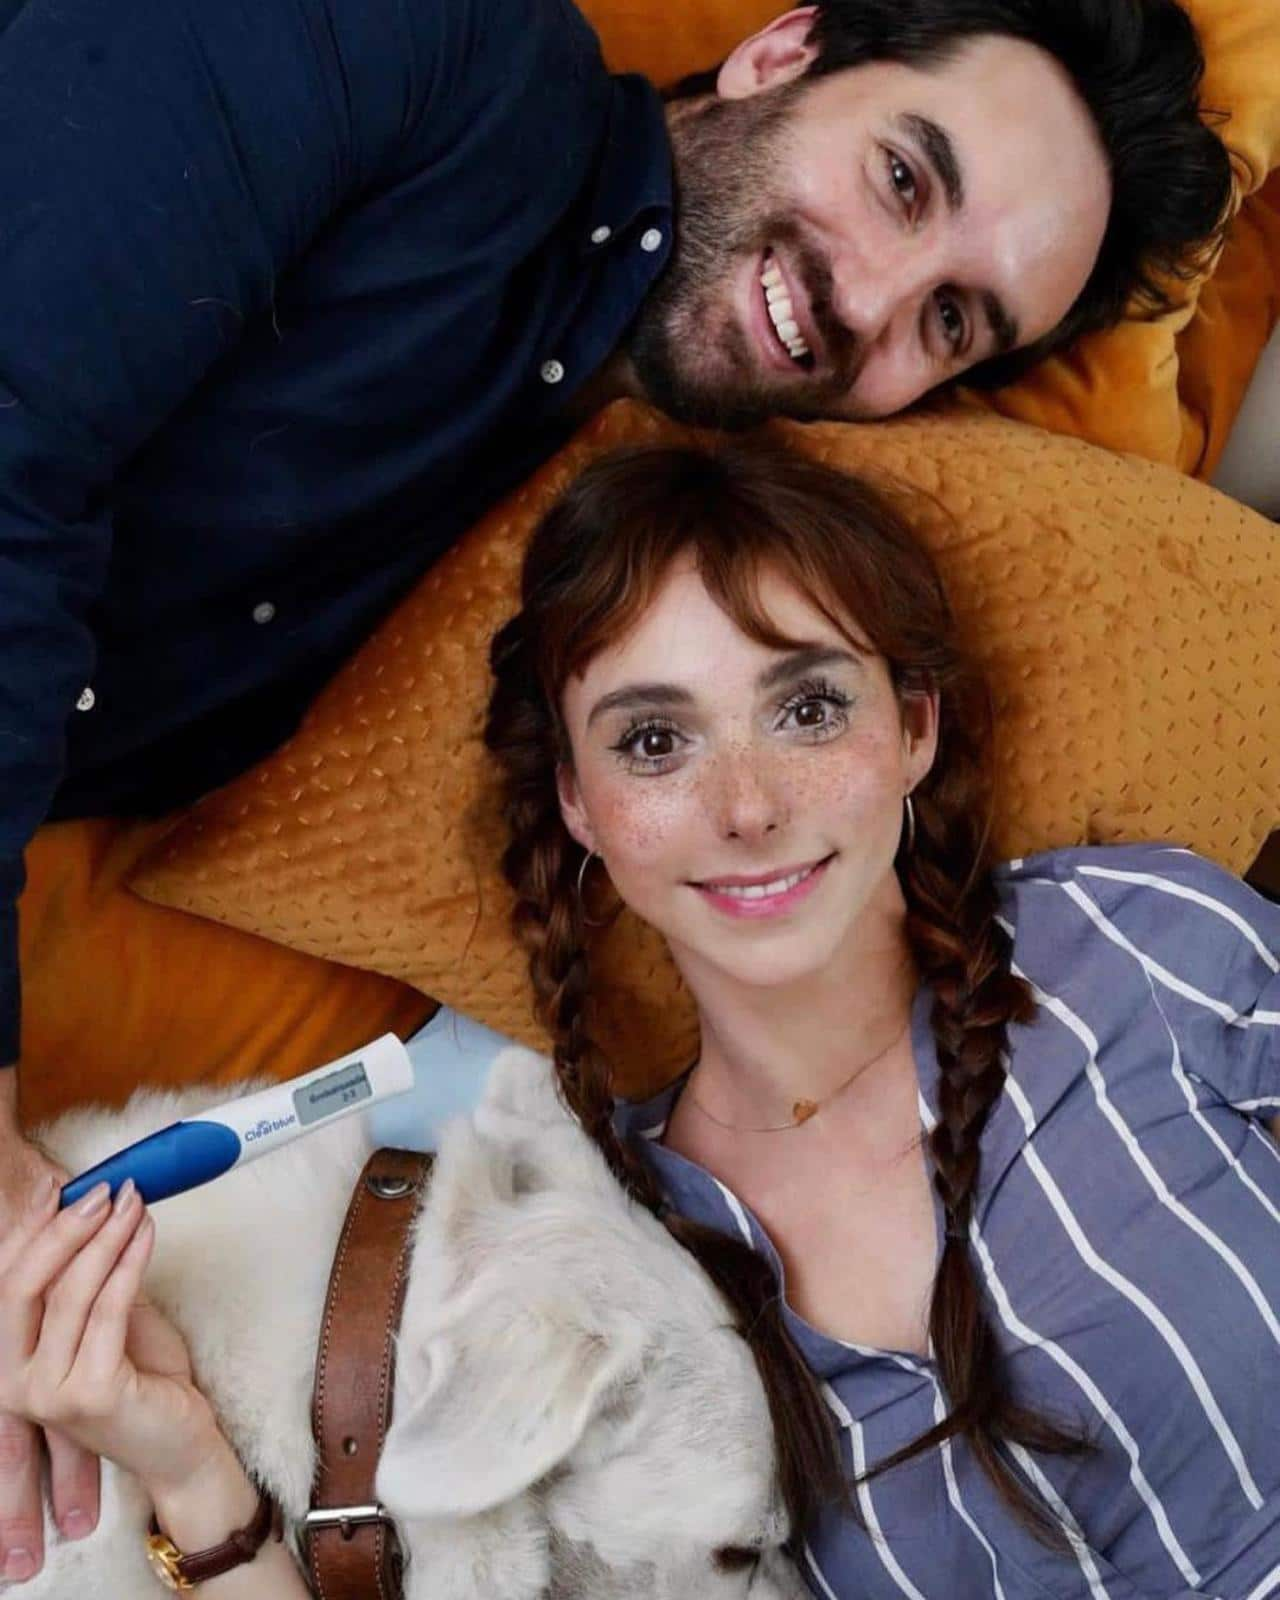 Natalia Tellez ataques embarazo apoyo aborto